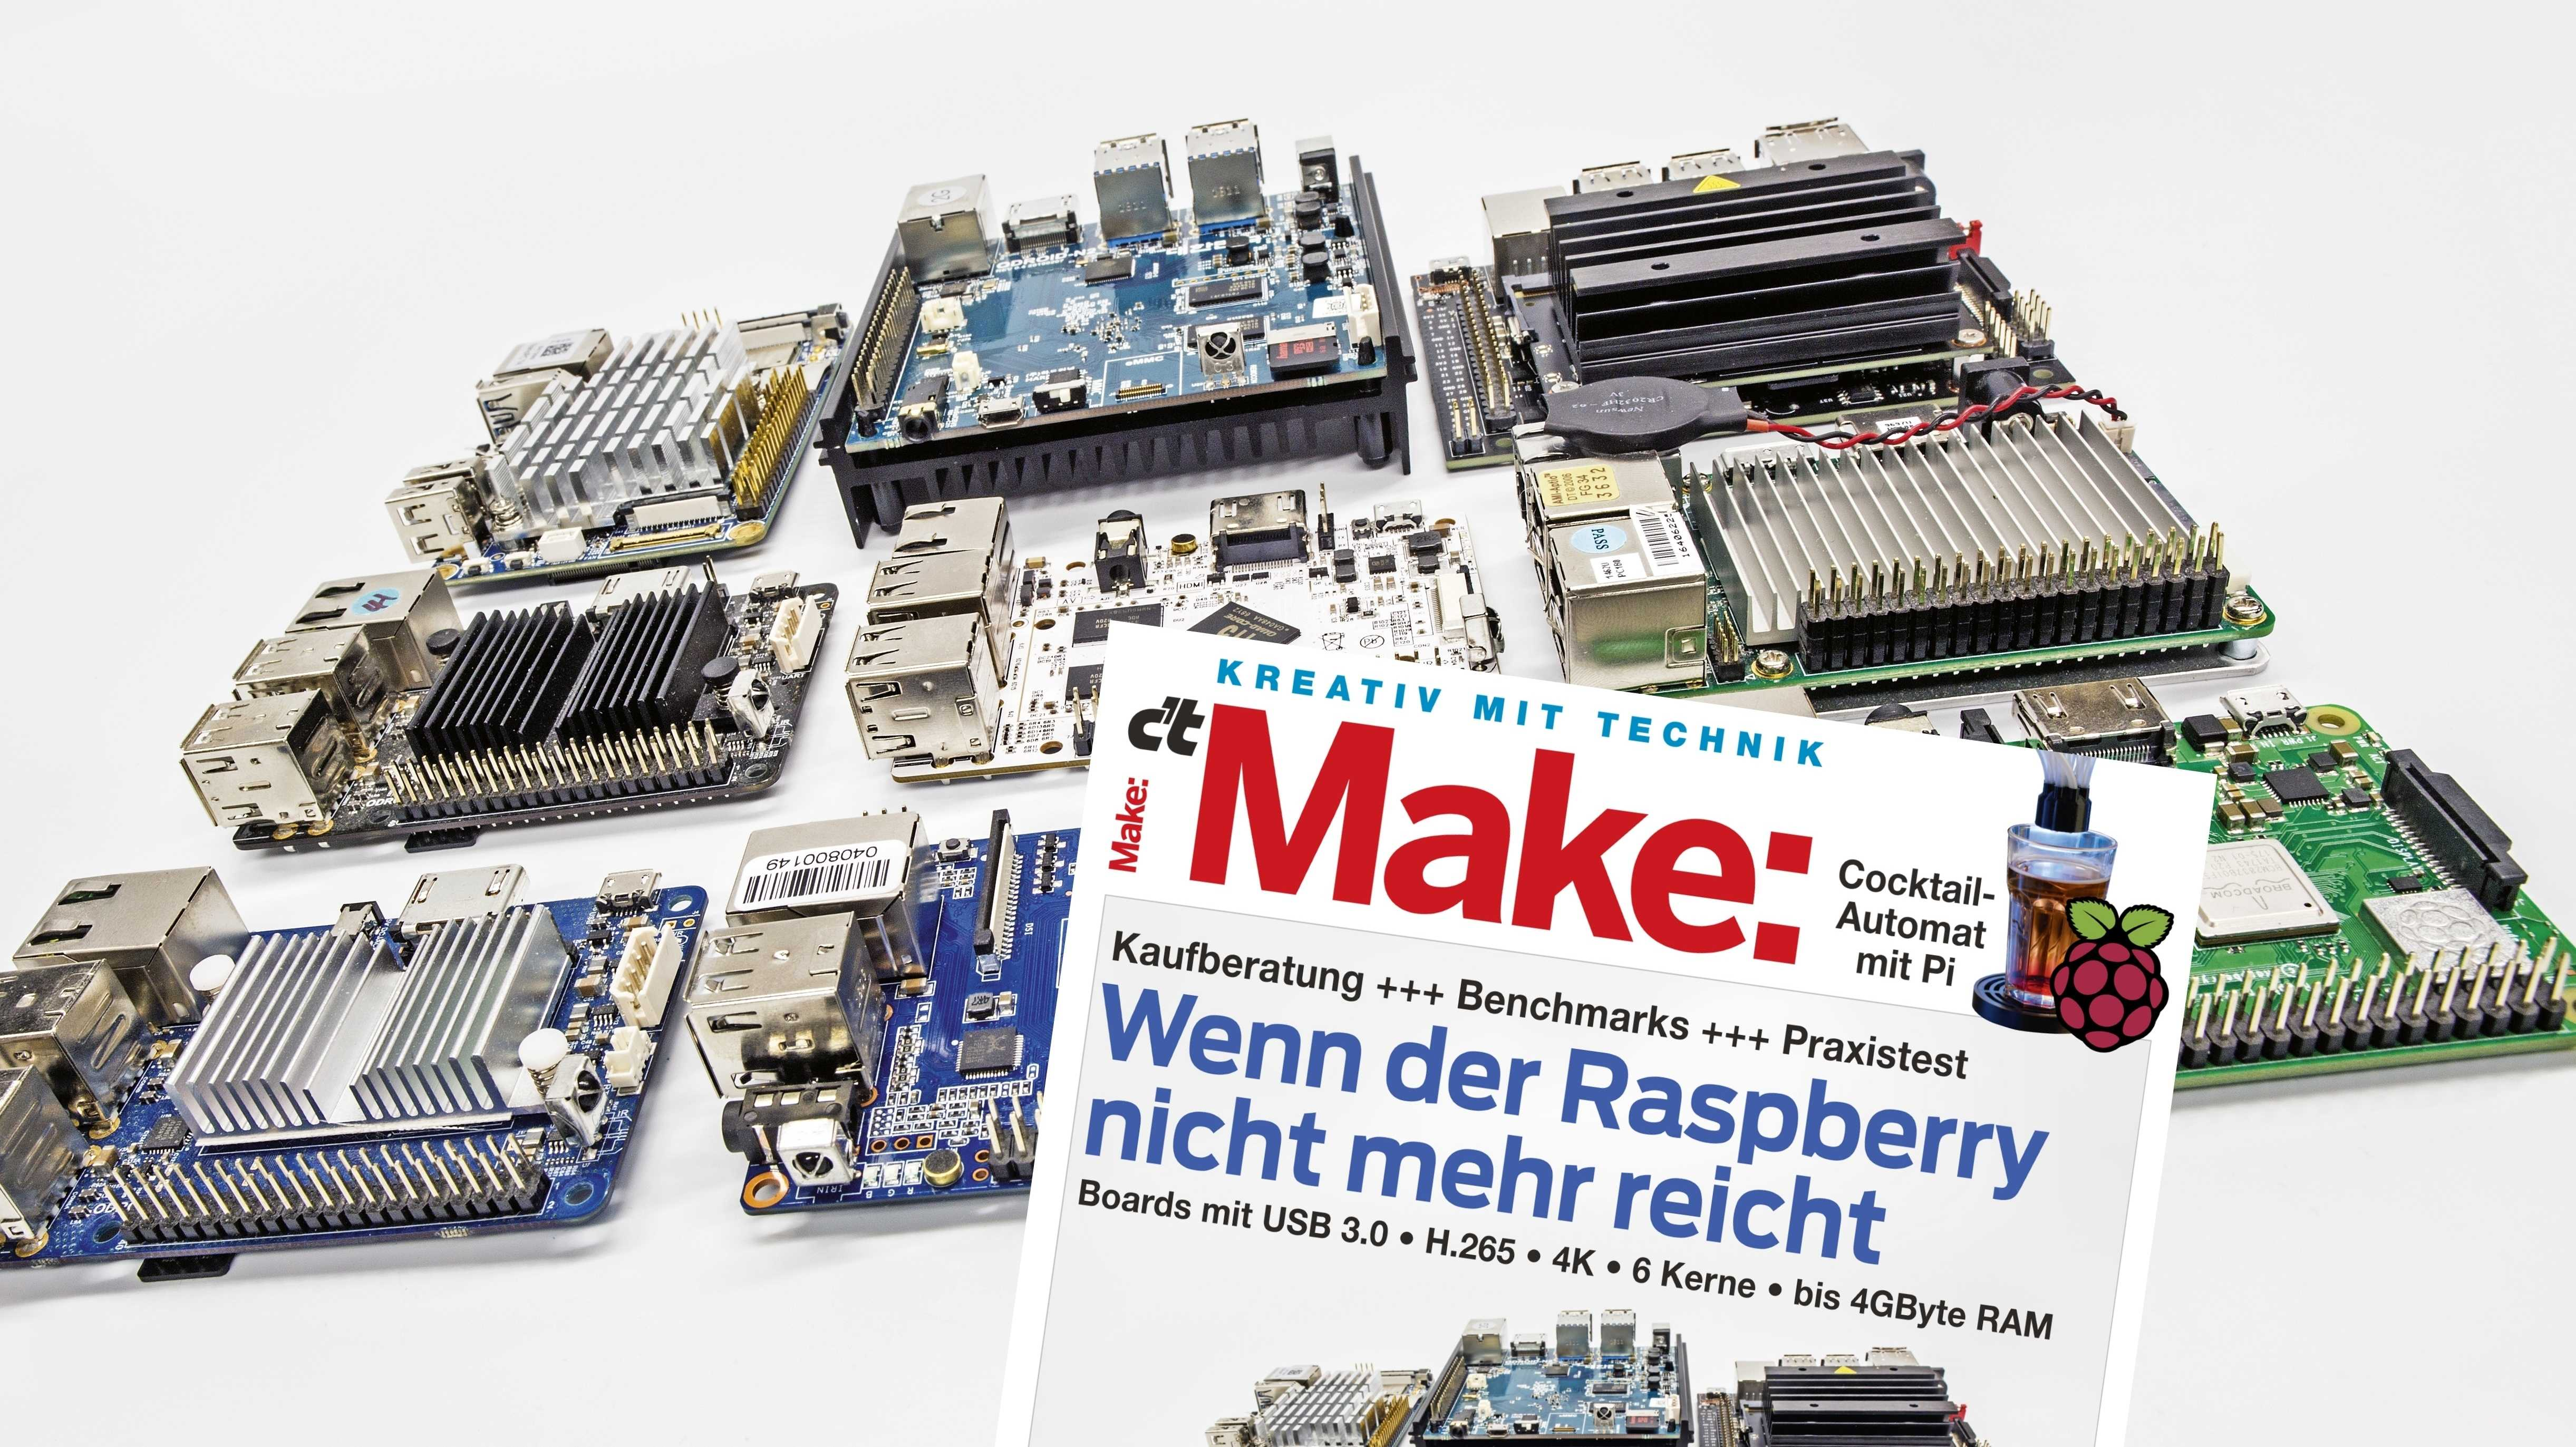 Make-Cover neben neun Einplatinenrechnern.